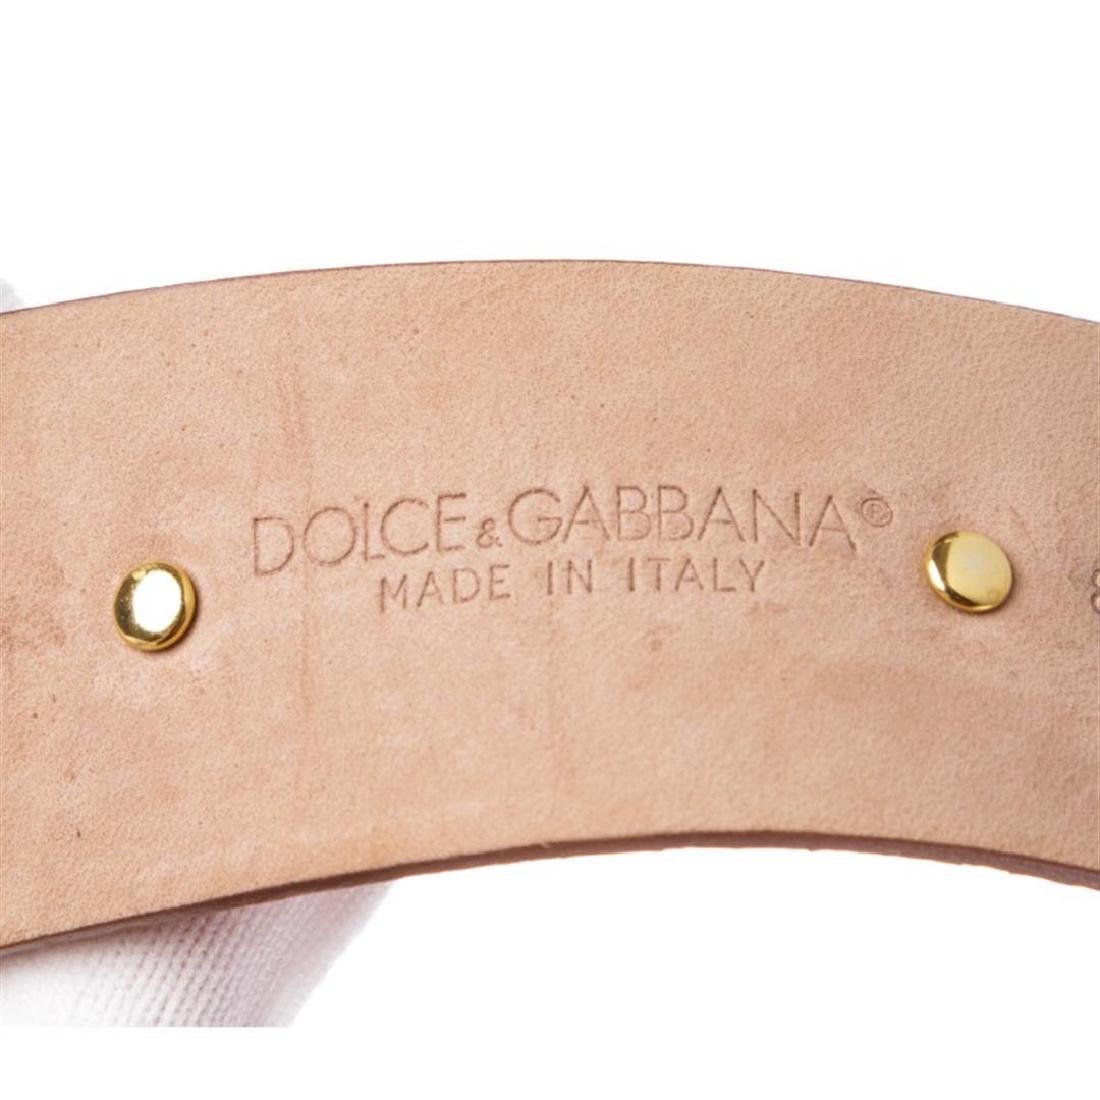 Dolce & Gabbana Brown Snakeskin Rhinestone Buckle Belt - 6